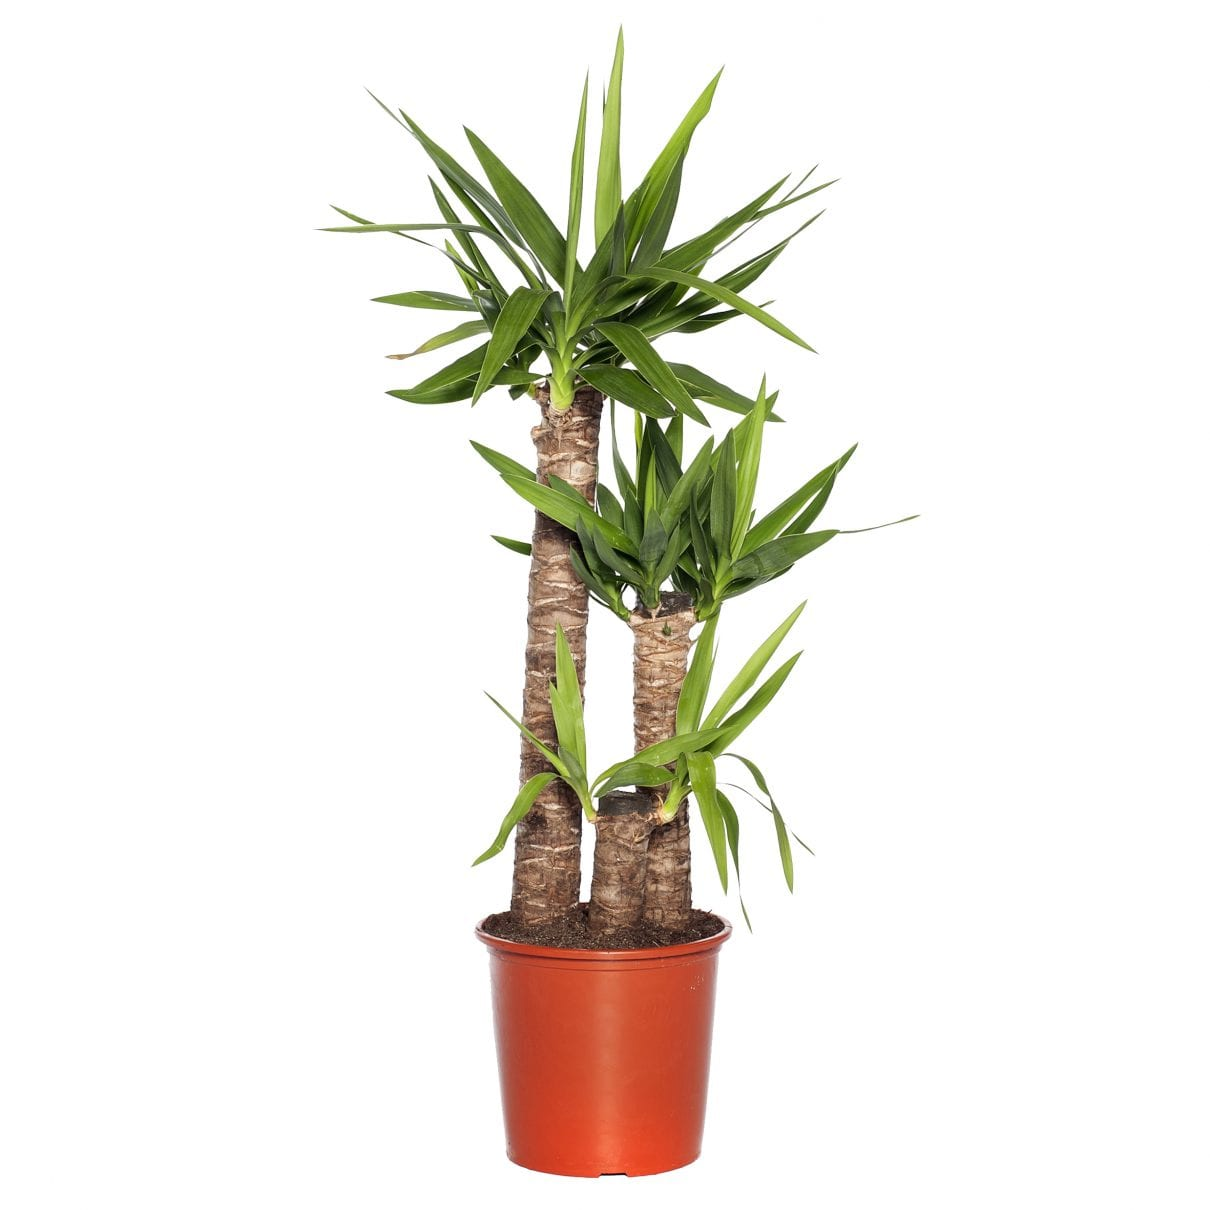 Palmlelie (Yucca elephantipes)